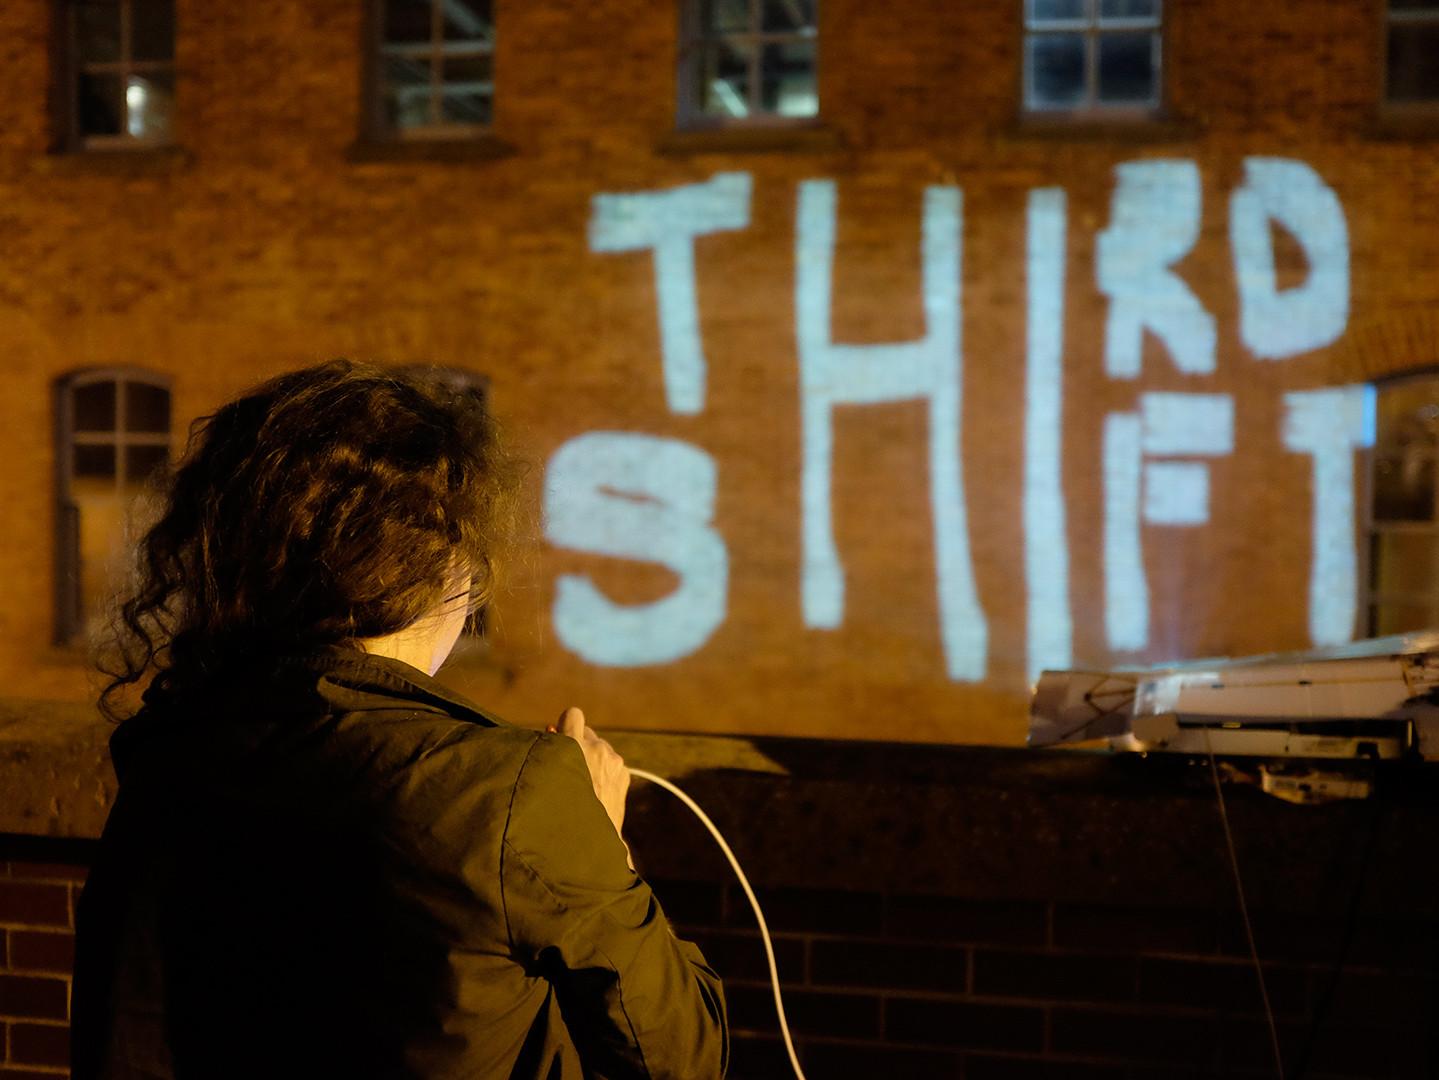 Kate MacDonald - Third Shift 2016